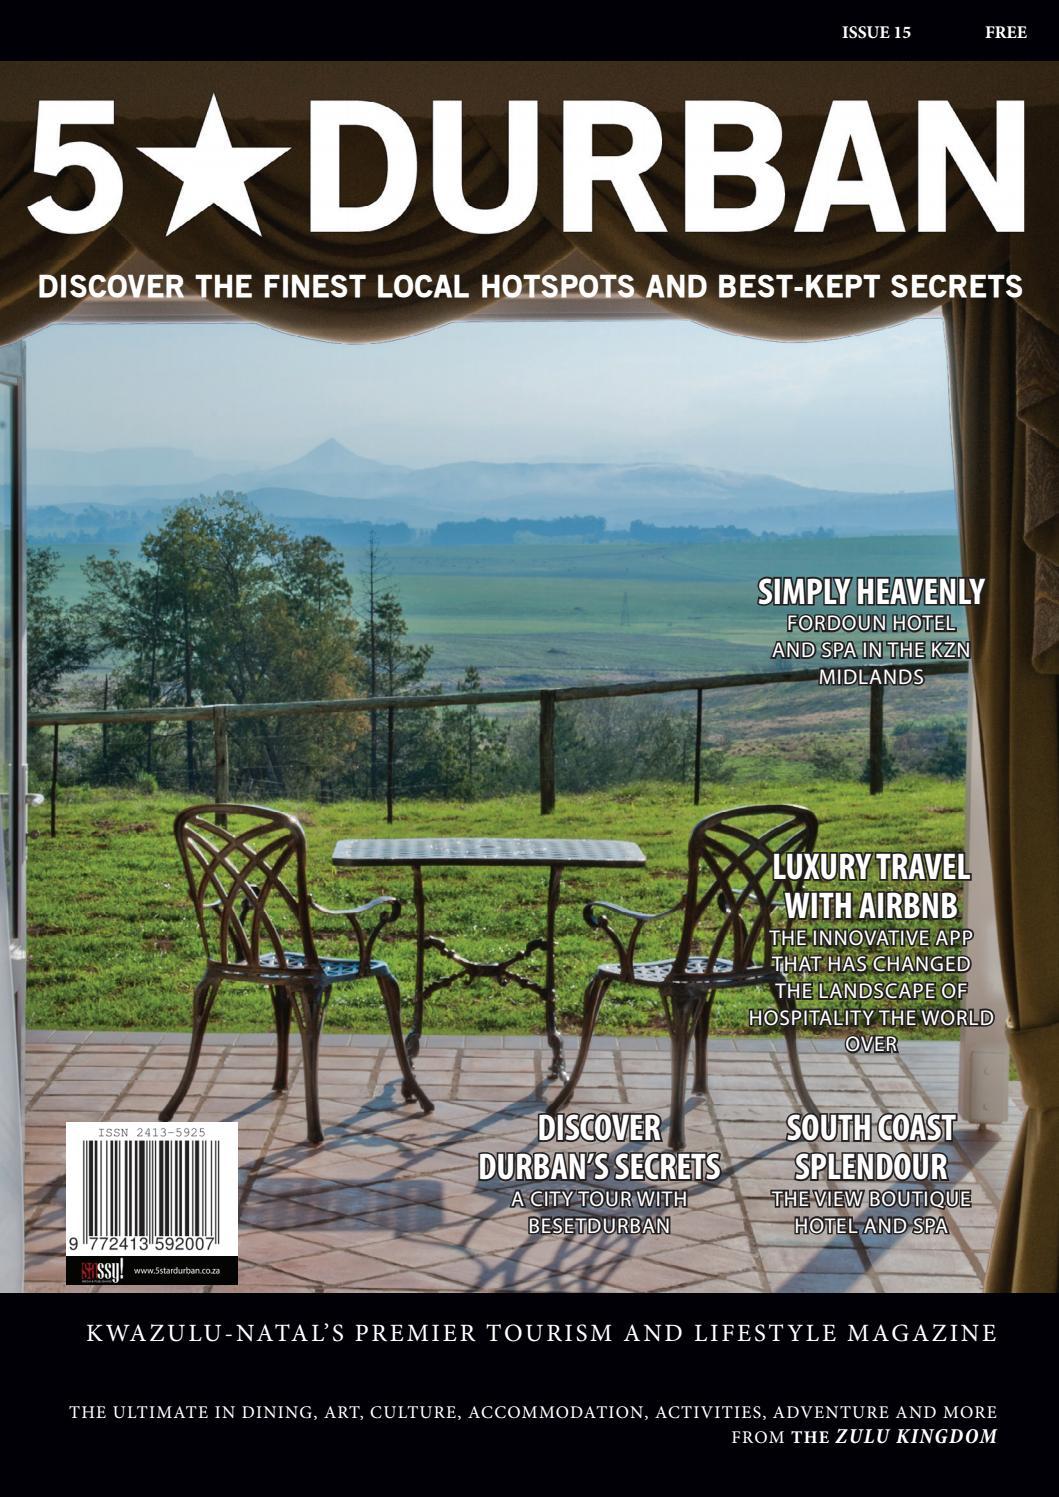 5 Star Durban Issue 15 by